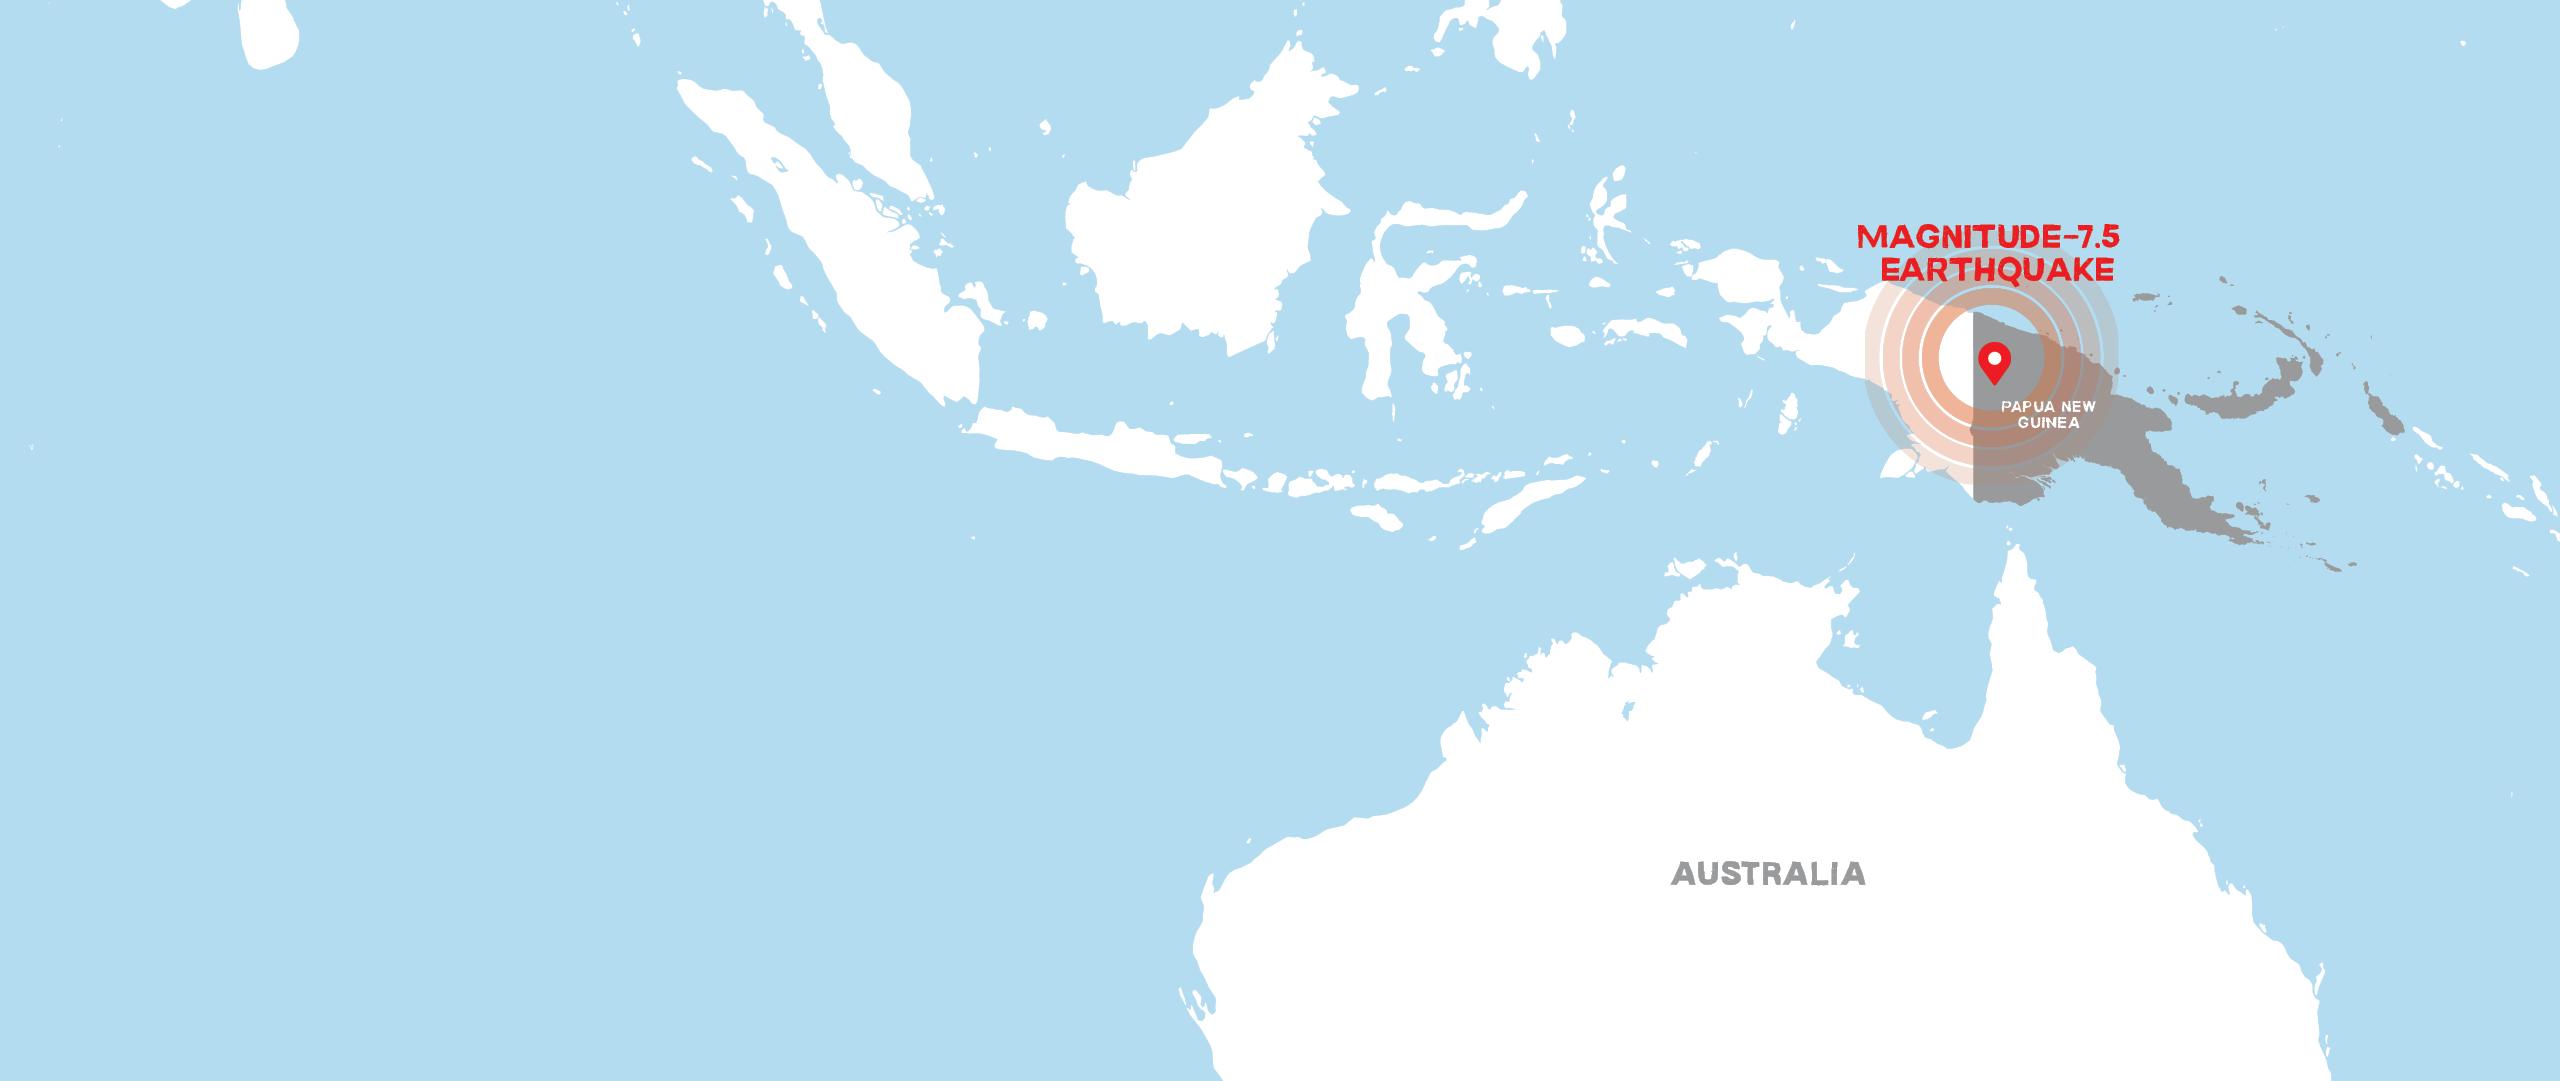 000512_PNG_Earthquake_Slider-6